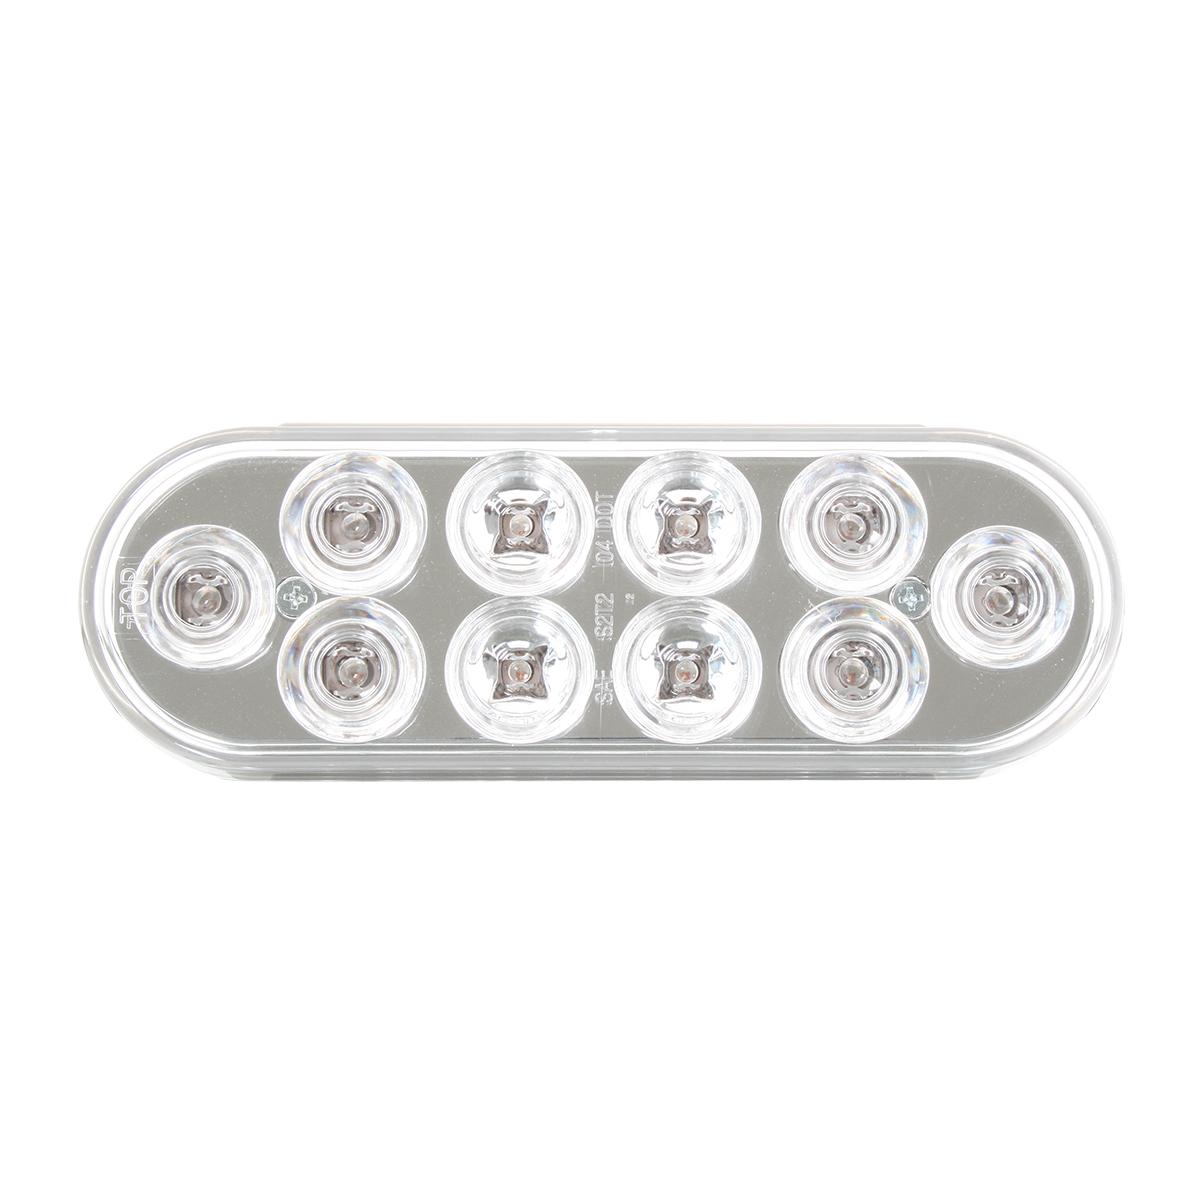 Oval Mega 10 Plus LED Light in Clear Lens